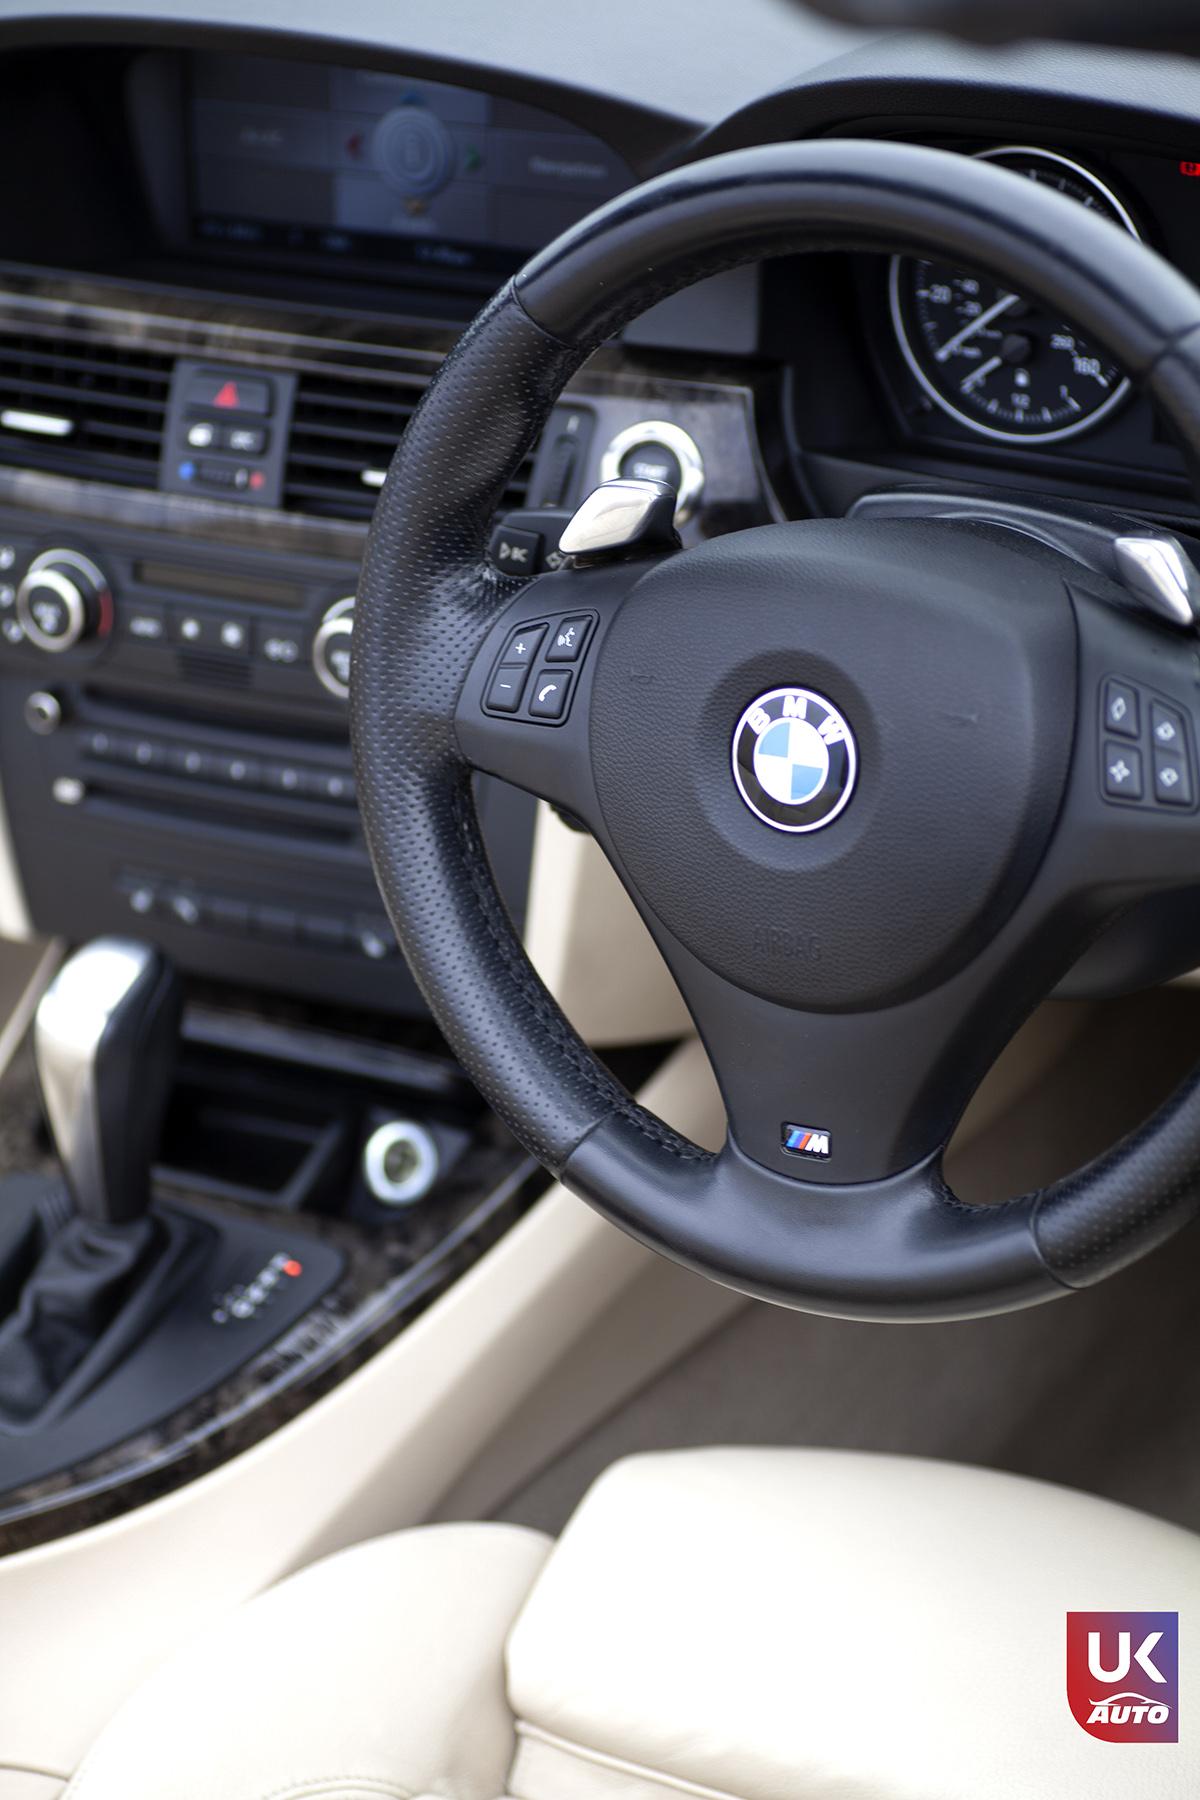 IMG 2999 - Import BMW 335I RHD PACK M PAR NOTRE CLIENT UKAUTO Félicitation a Christopher